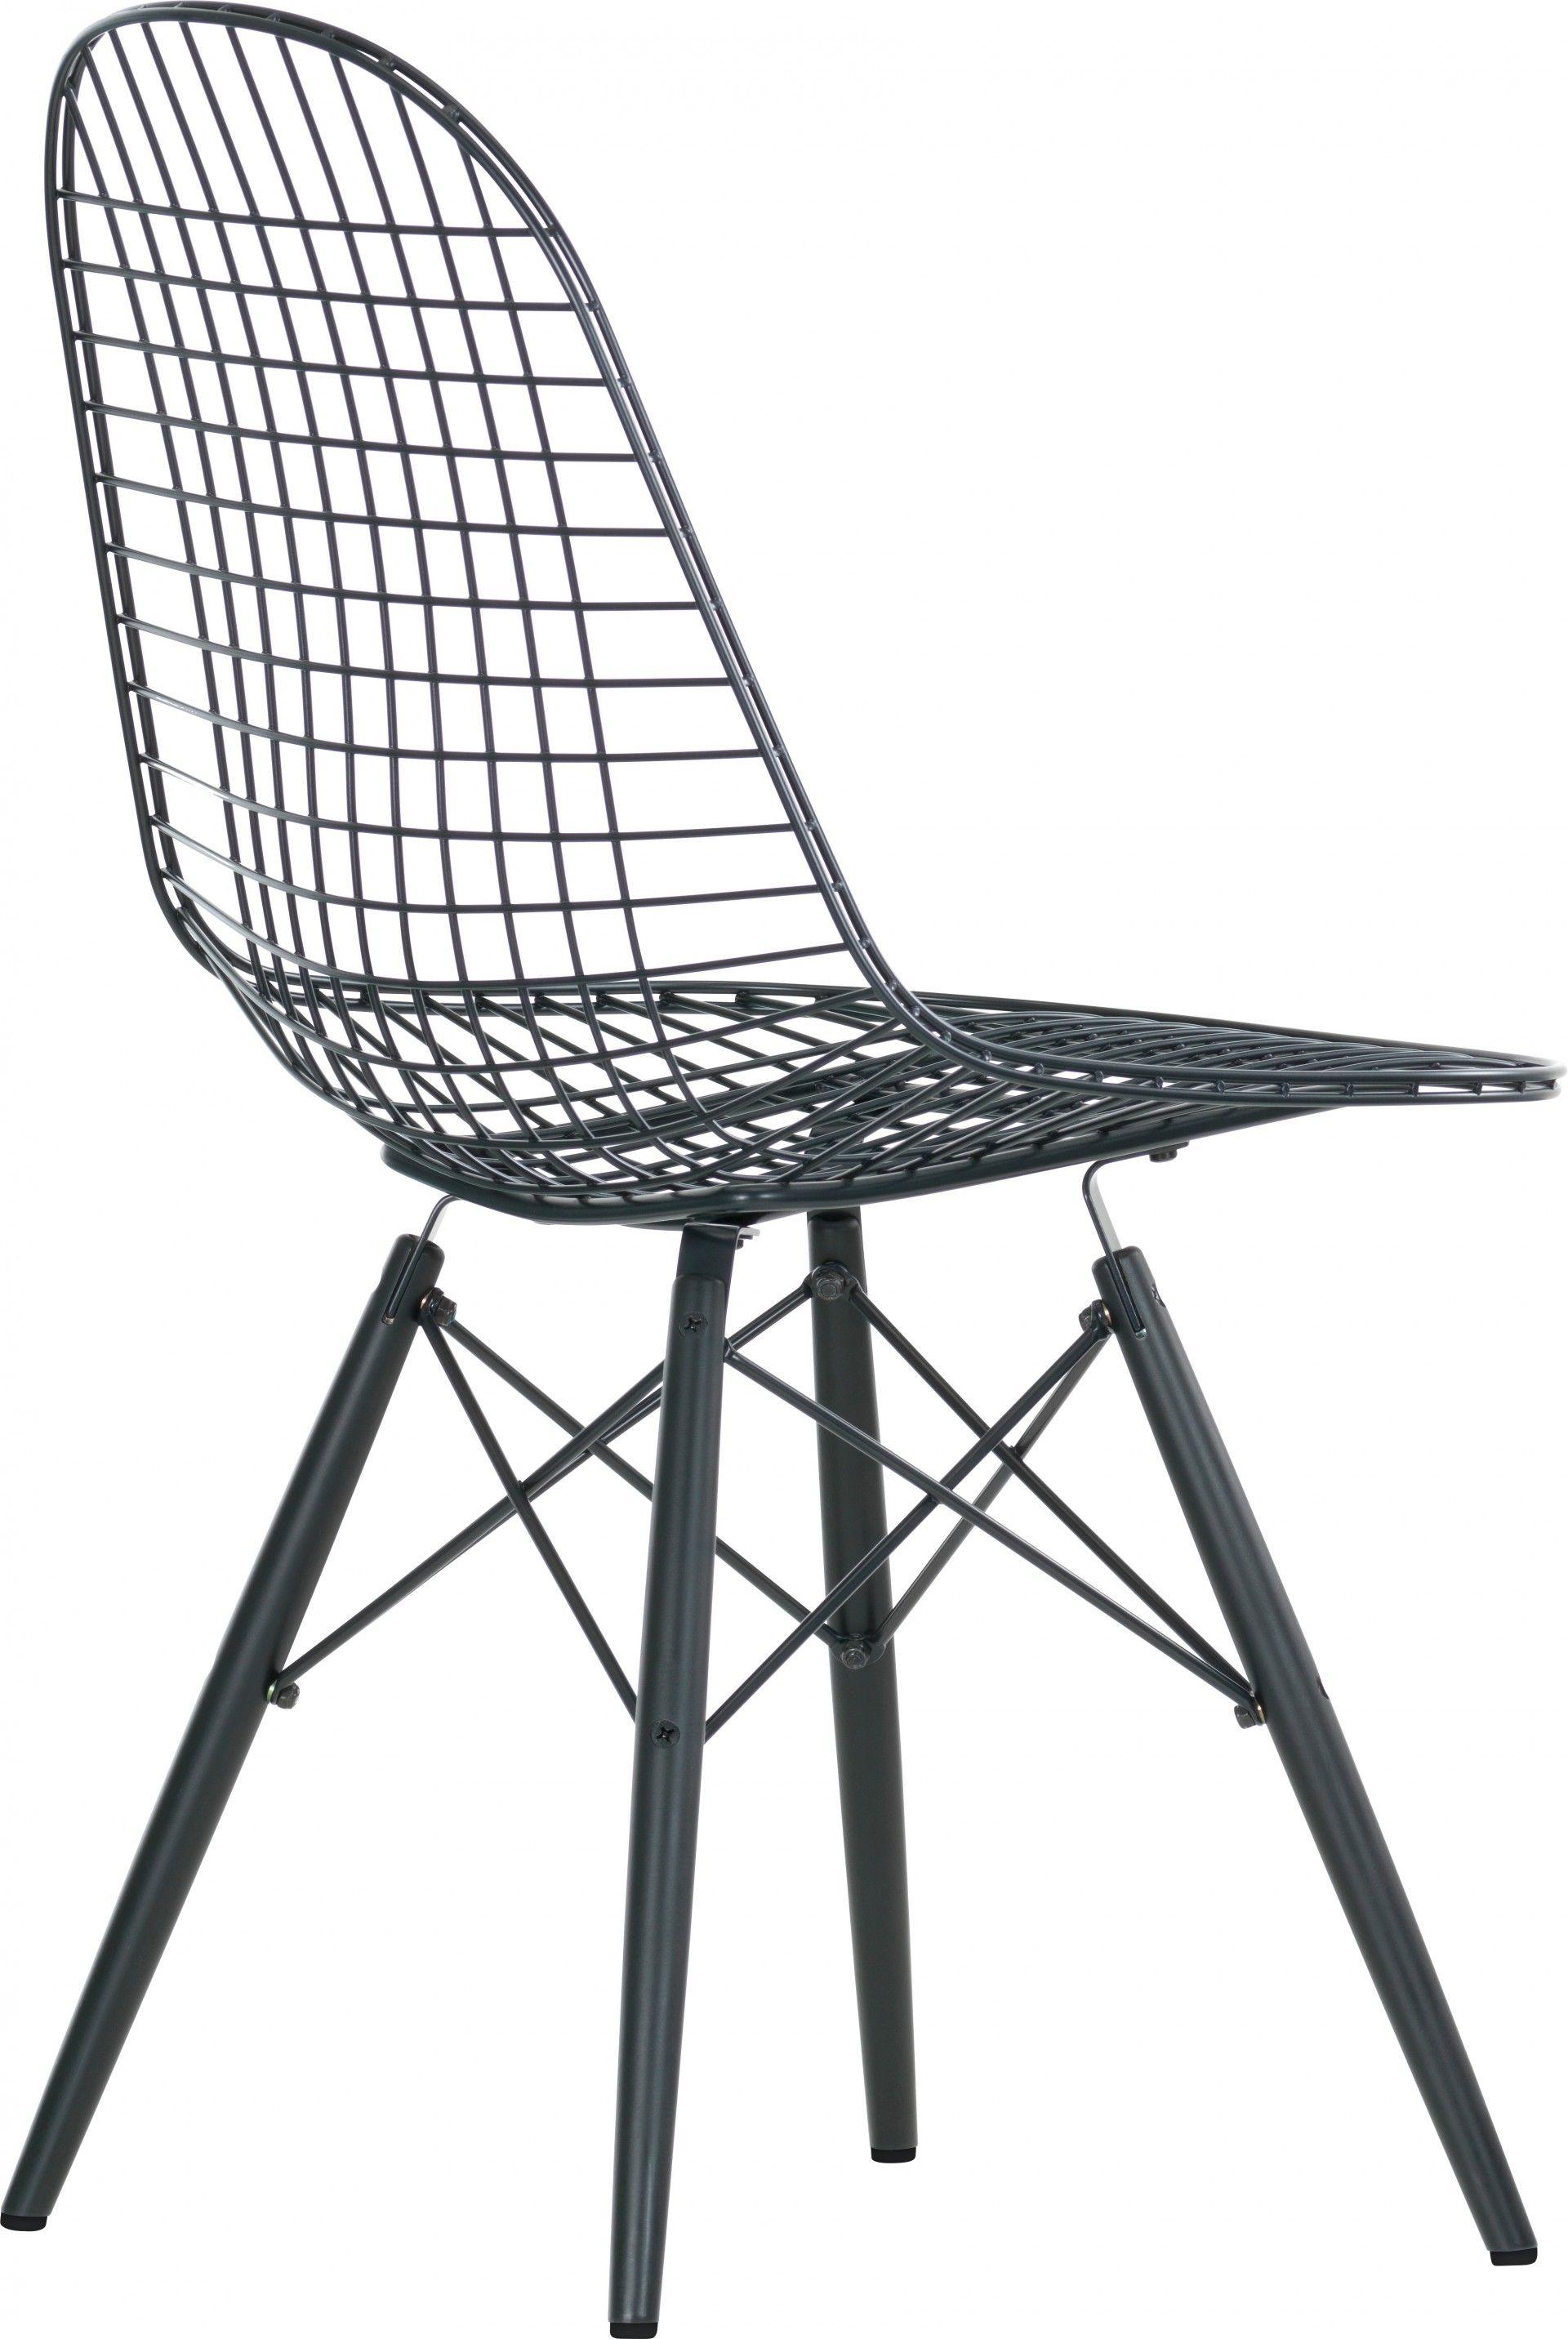 Eiffel Tower Wire Chair Stapelbar Eames Stühle Eames Aluminium Group Executive Chair Von Charles Eames Lounge Sessel Stoff Eame Eames Wire Chairs Eames Chair